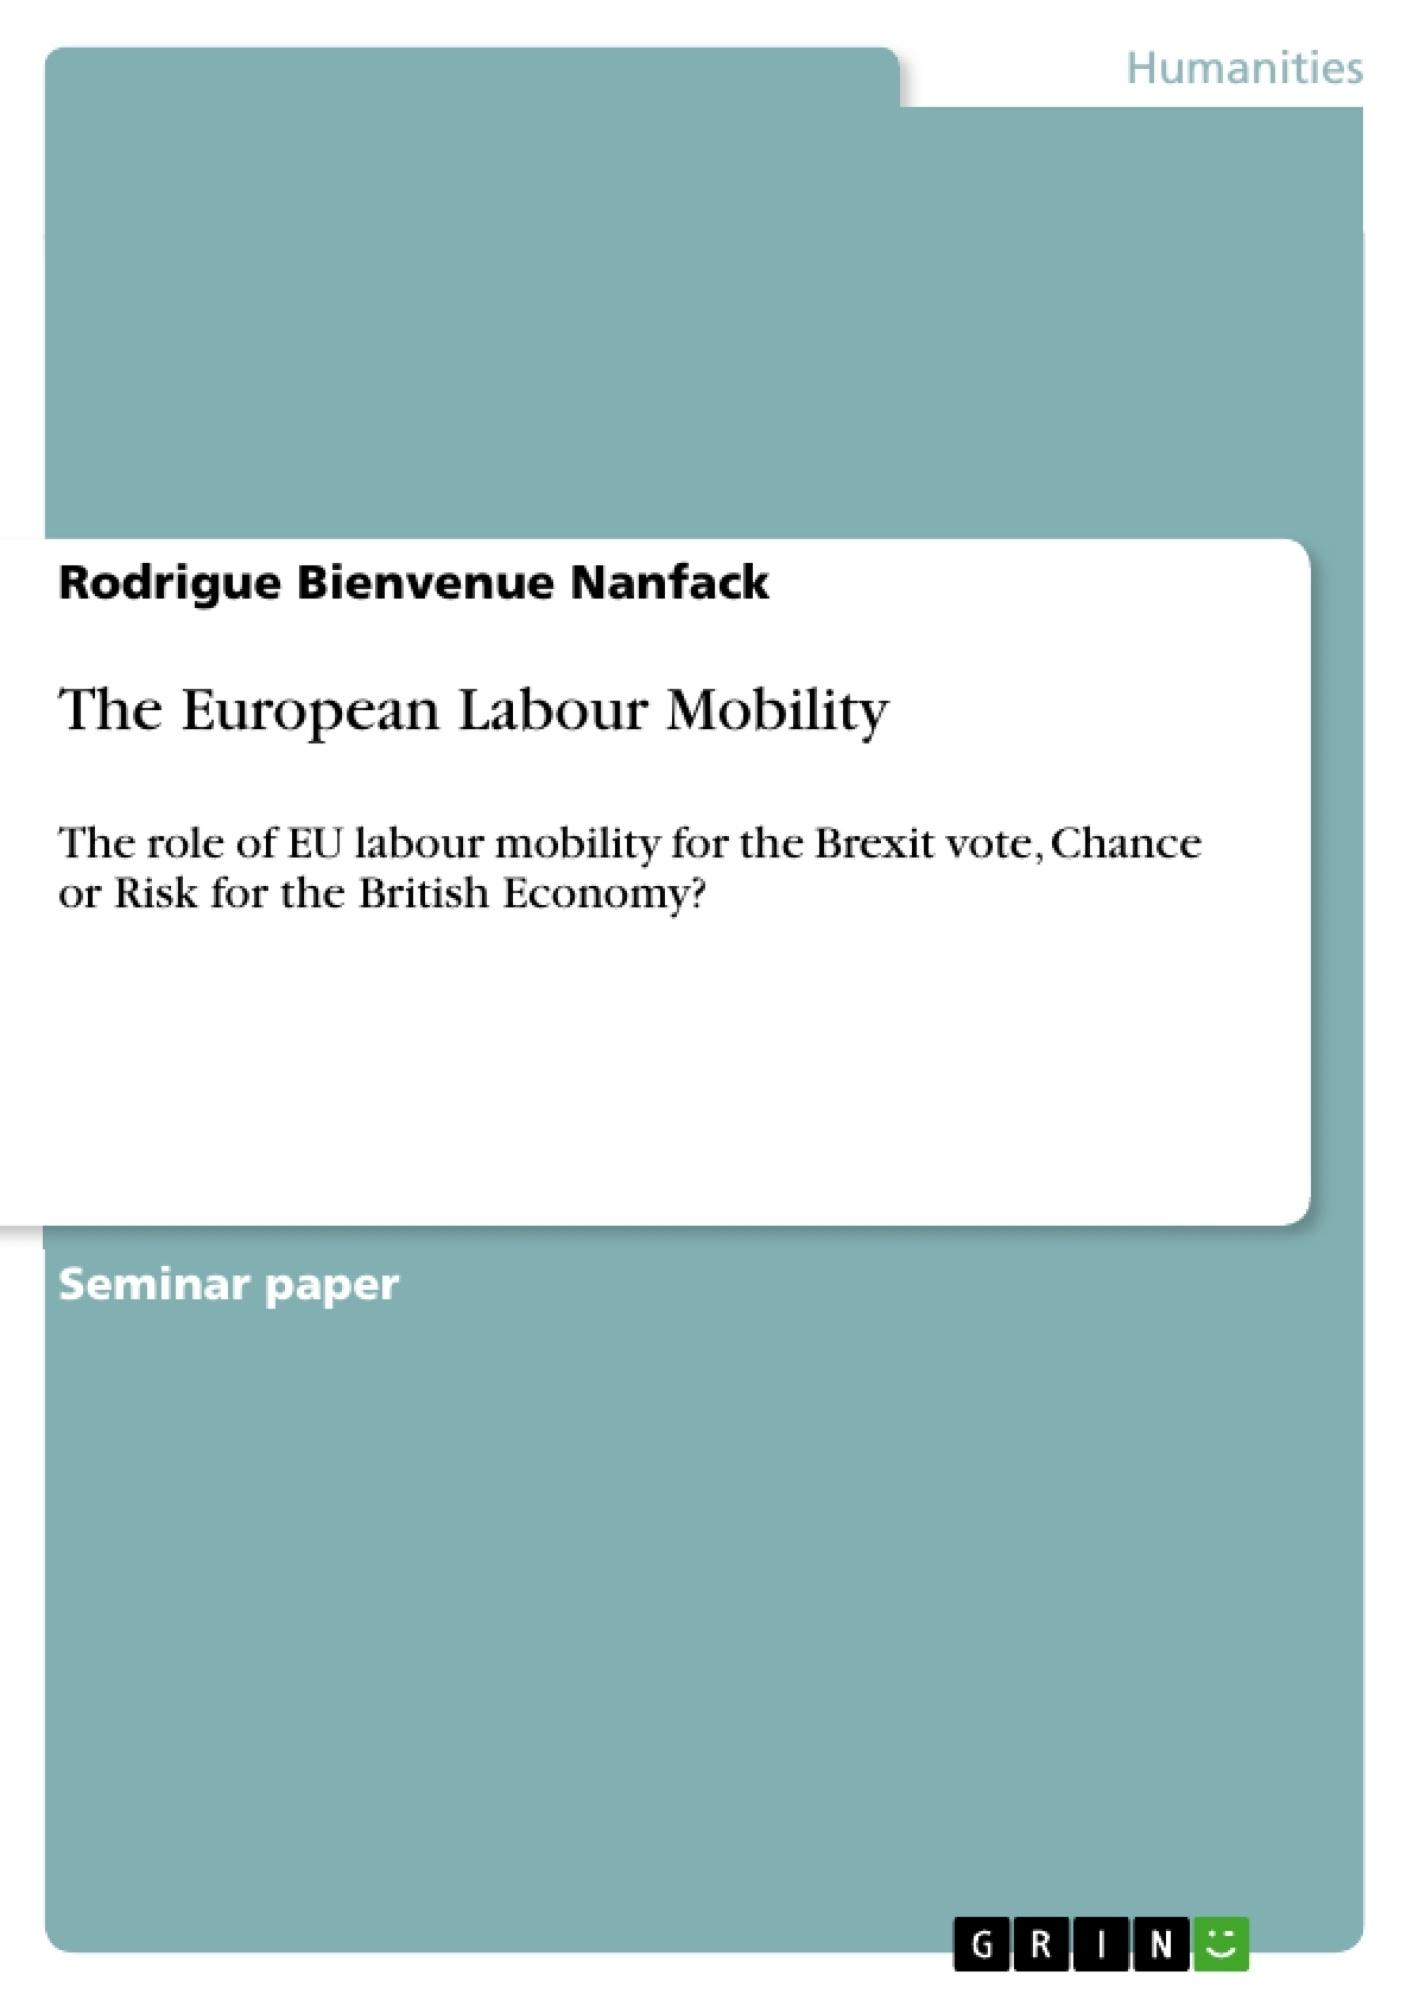 Title: The European Labour Mobility